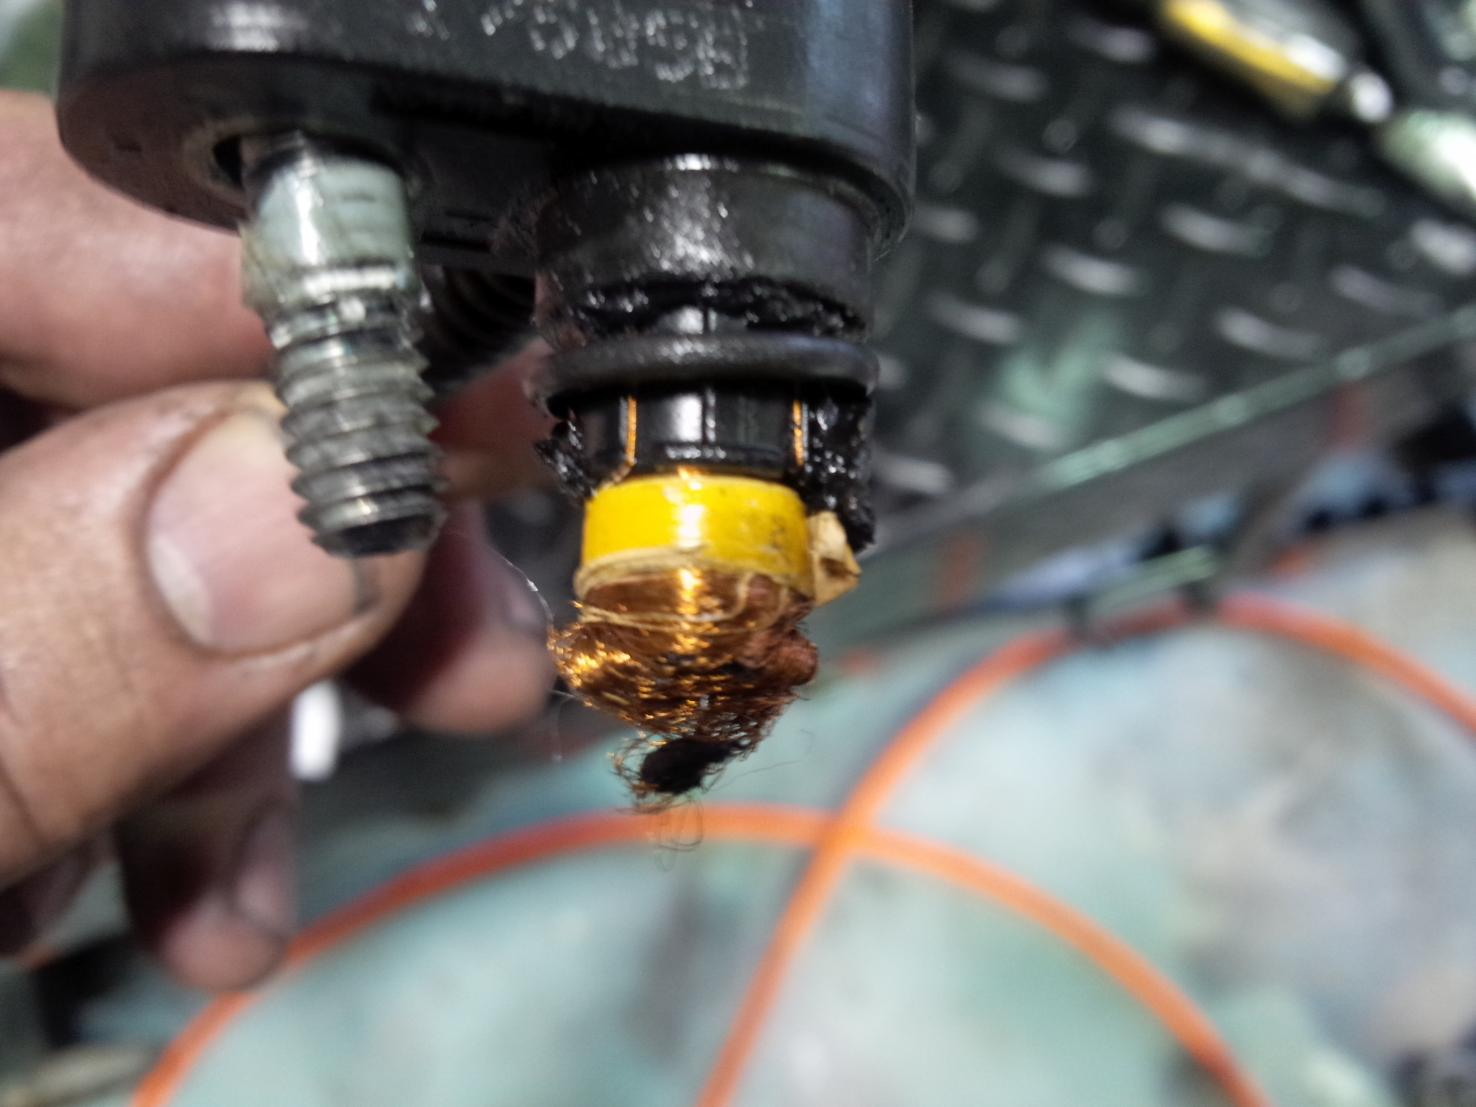 2006 Harley Softail Wiring Diagram Crank Position Sensor Exploded Harley Davidson Forums